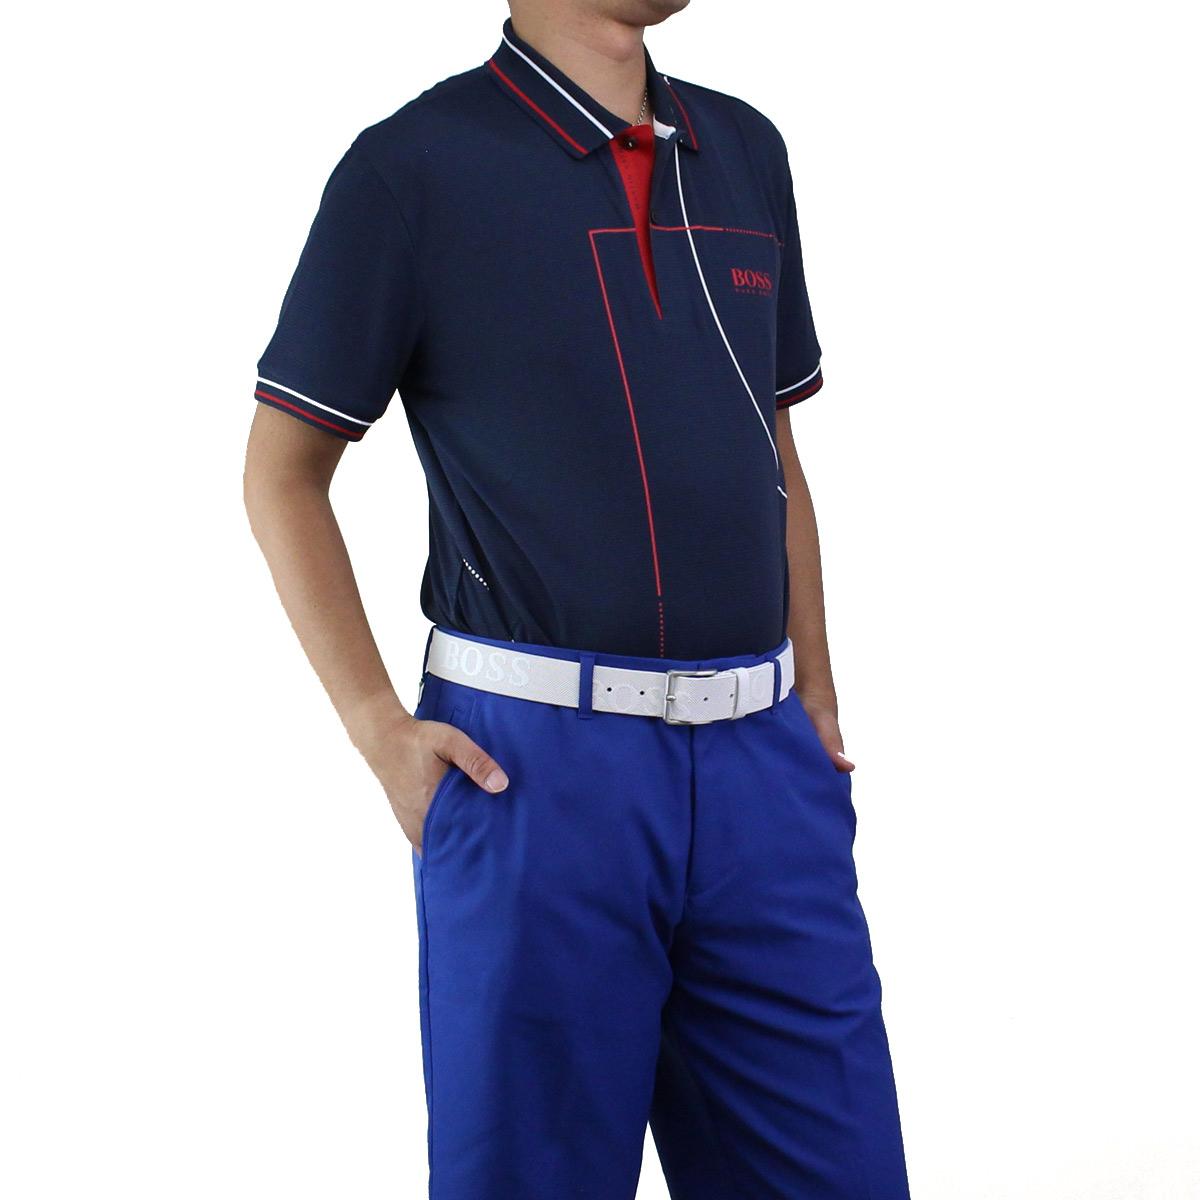 79c111811 Bighit The total brand wholesale: Men of Hugo Boss HUGO BOSS PADDY MK1  パディマーク 1 polo shirt short sleeves golf wear 50403516 10198091 410 navy  origin ...